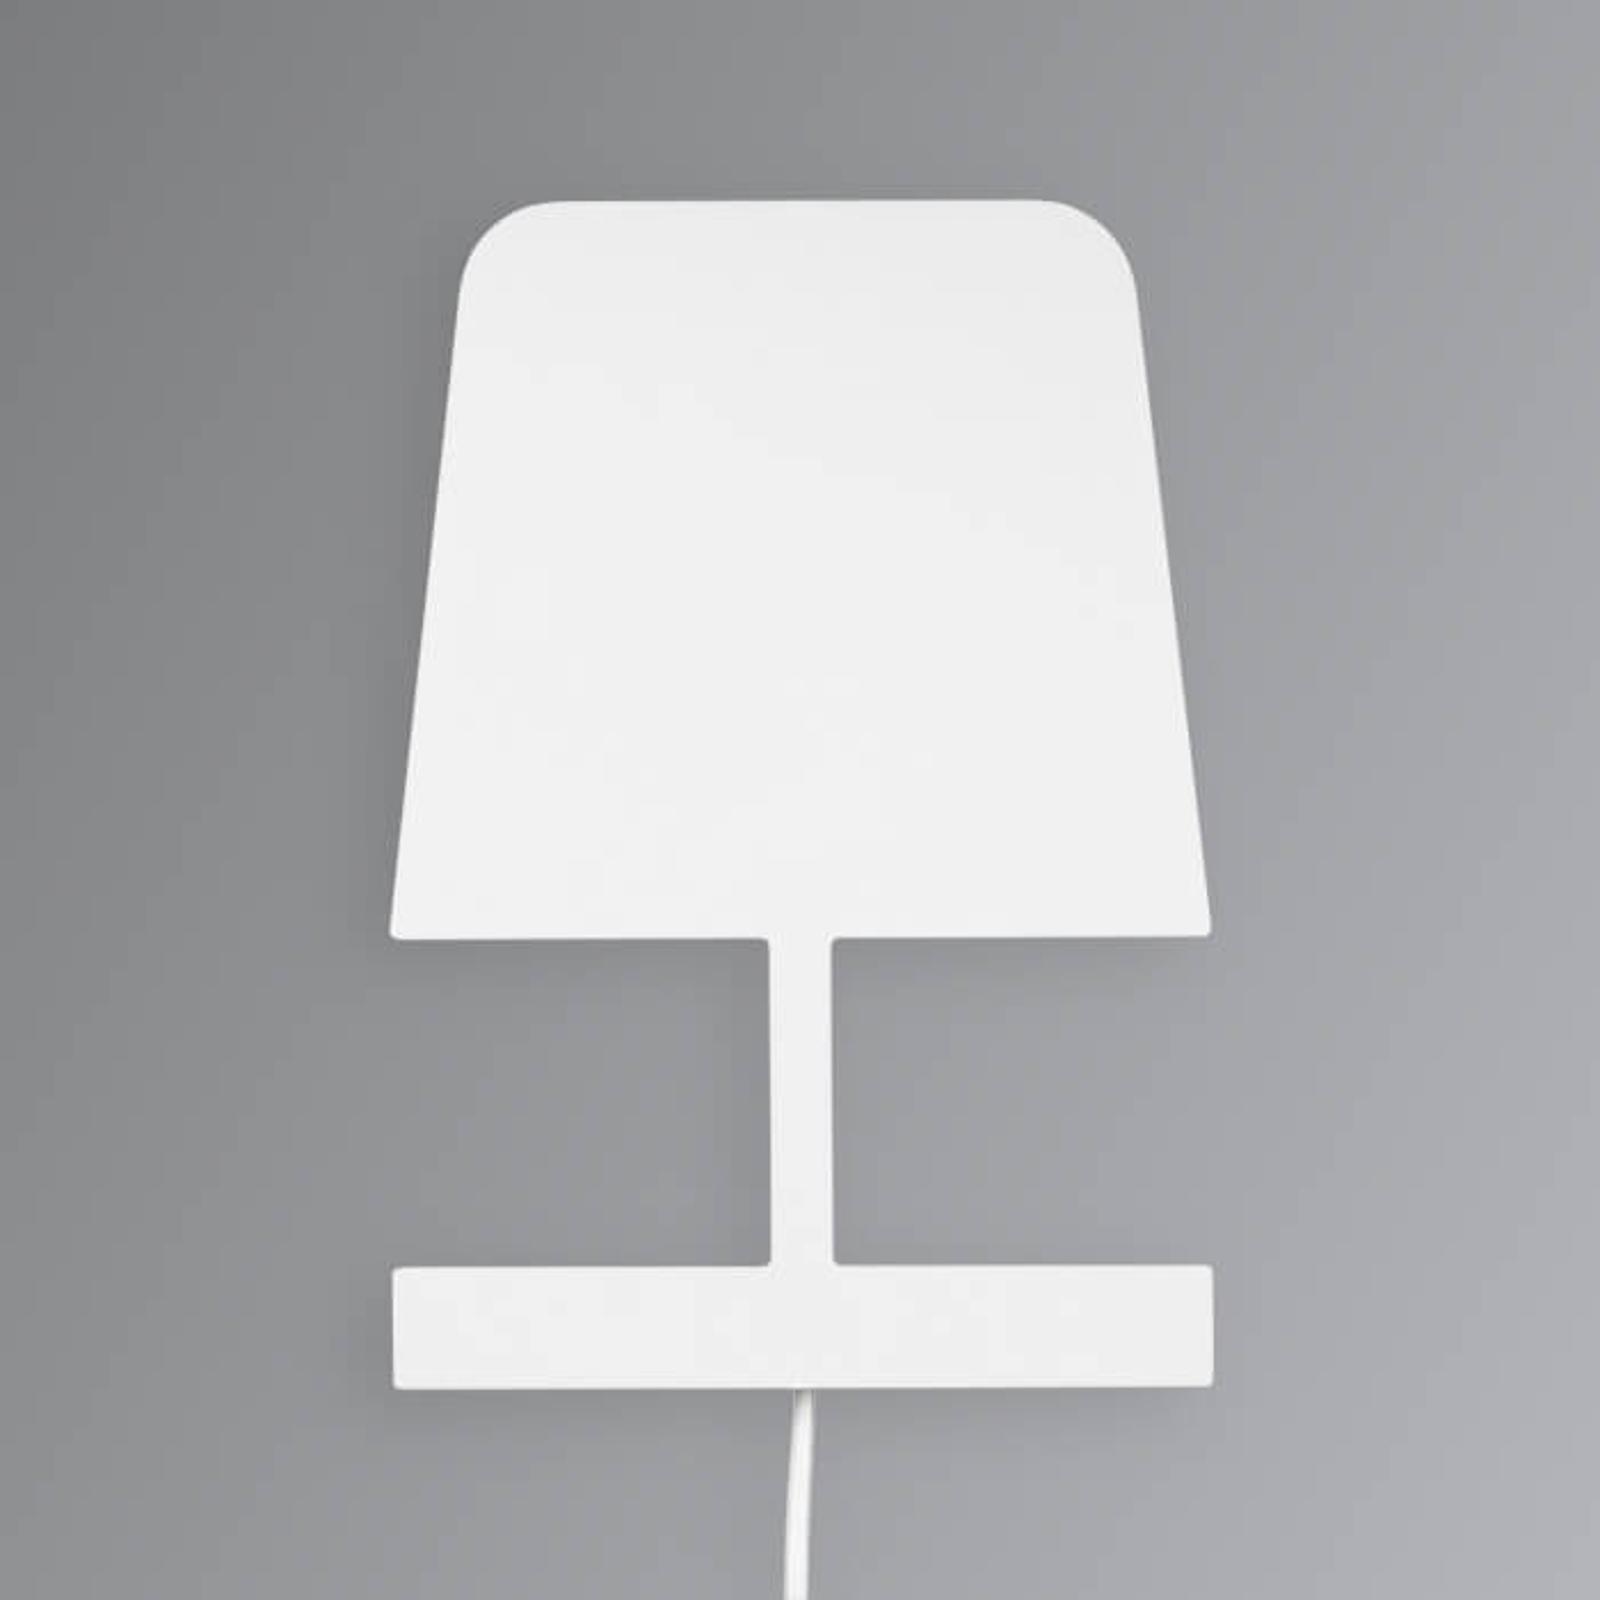 Vlakke design wandlamp Plates